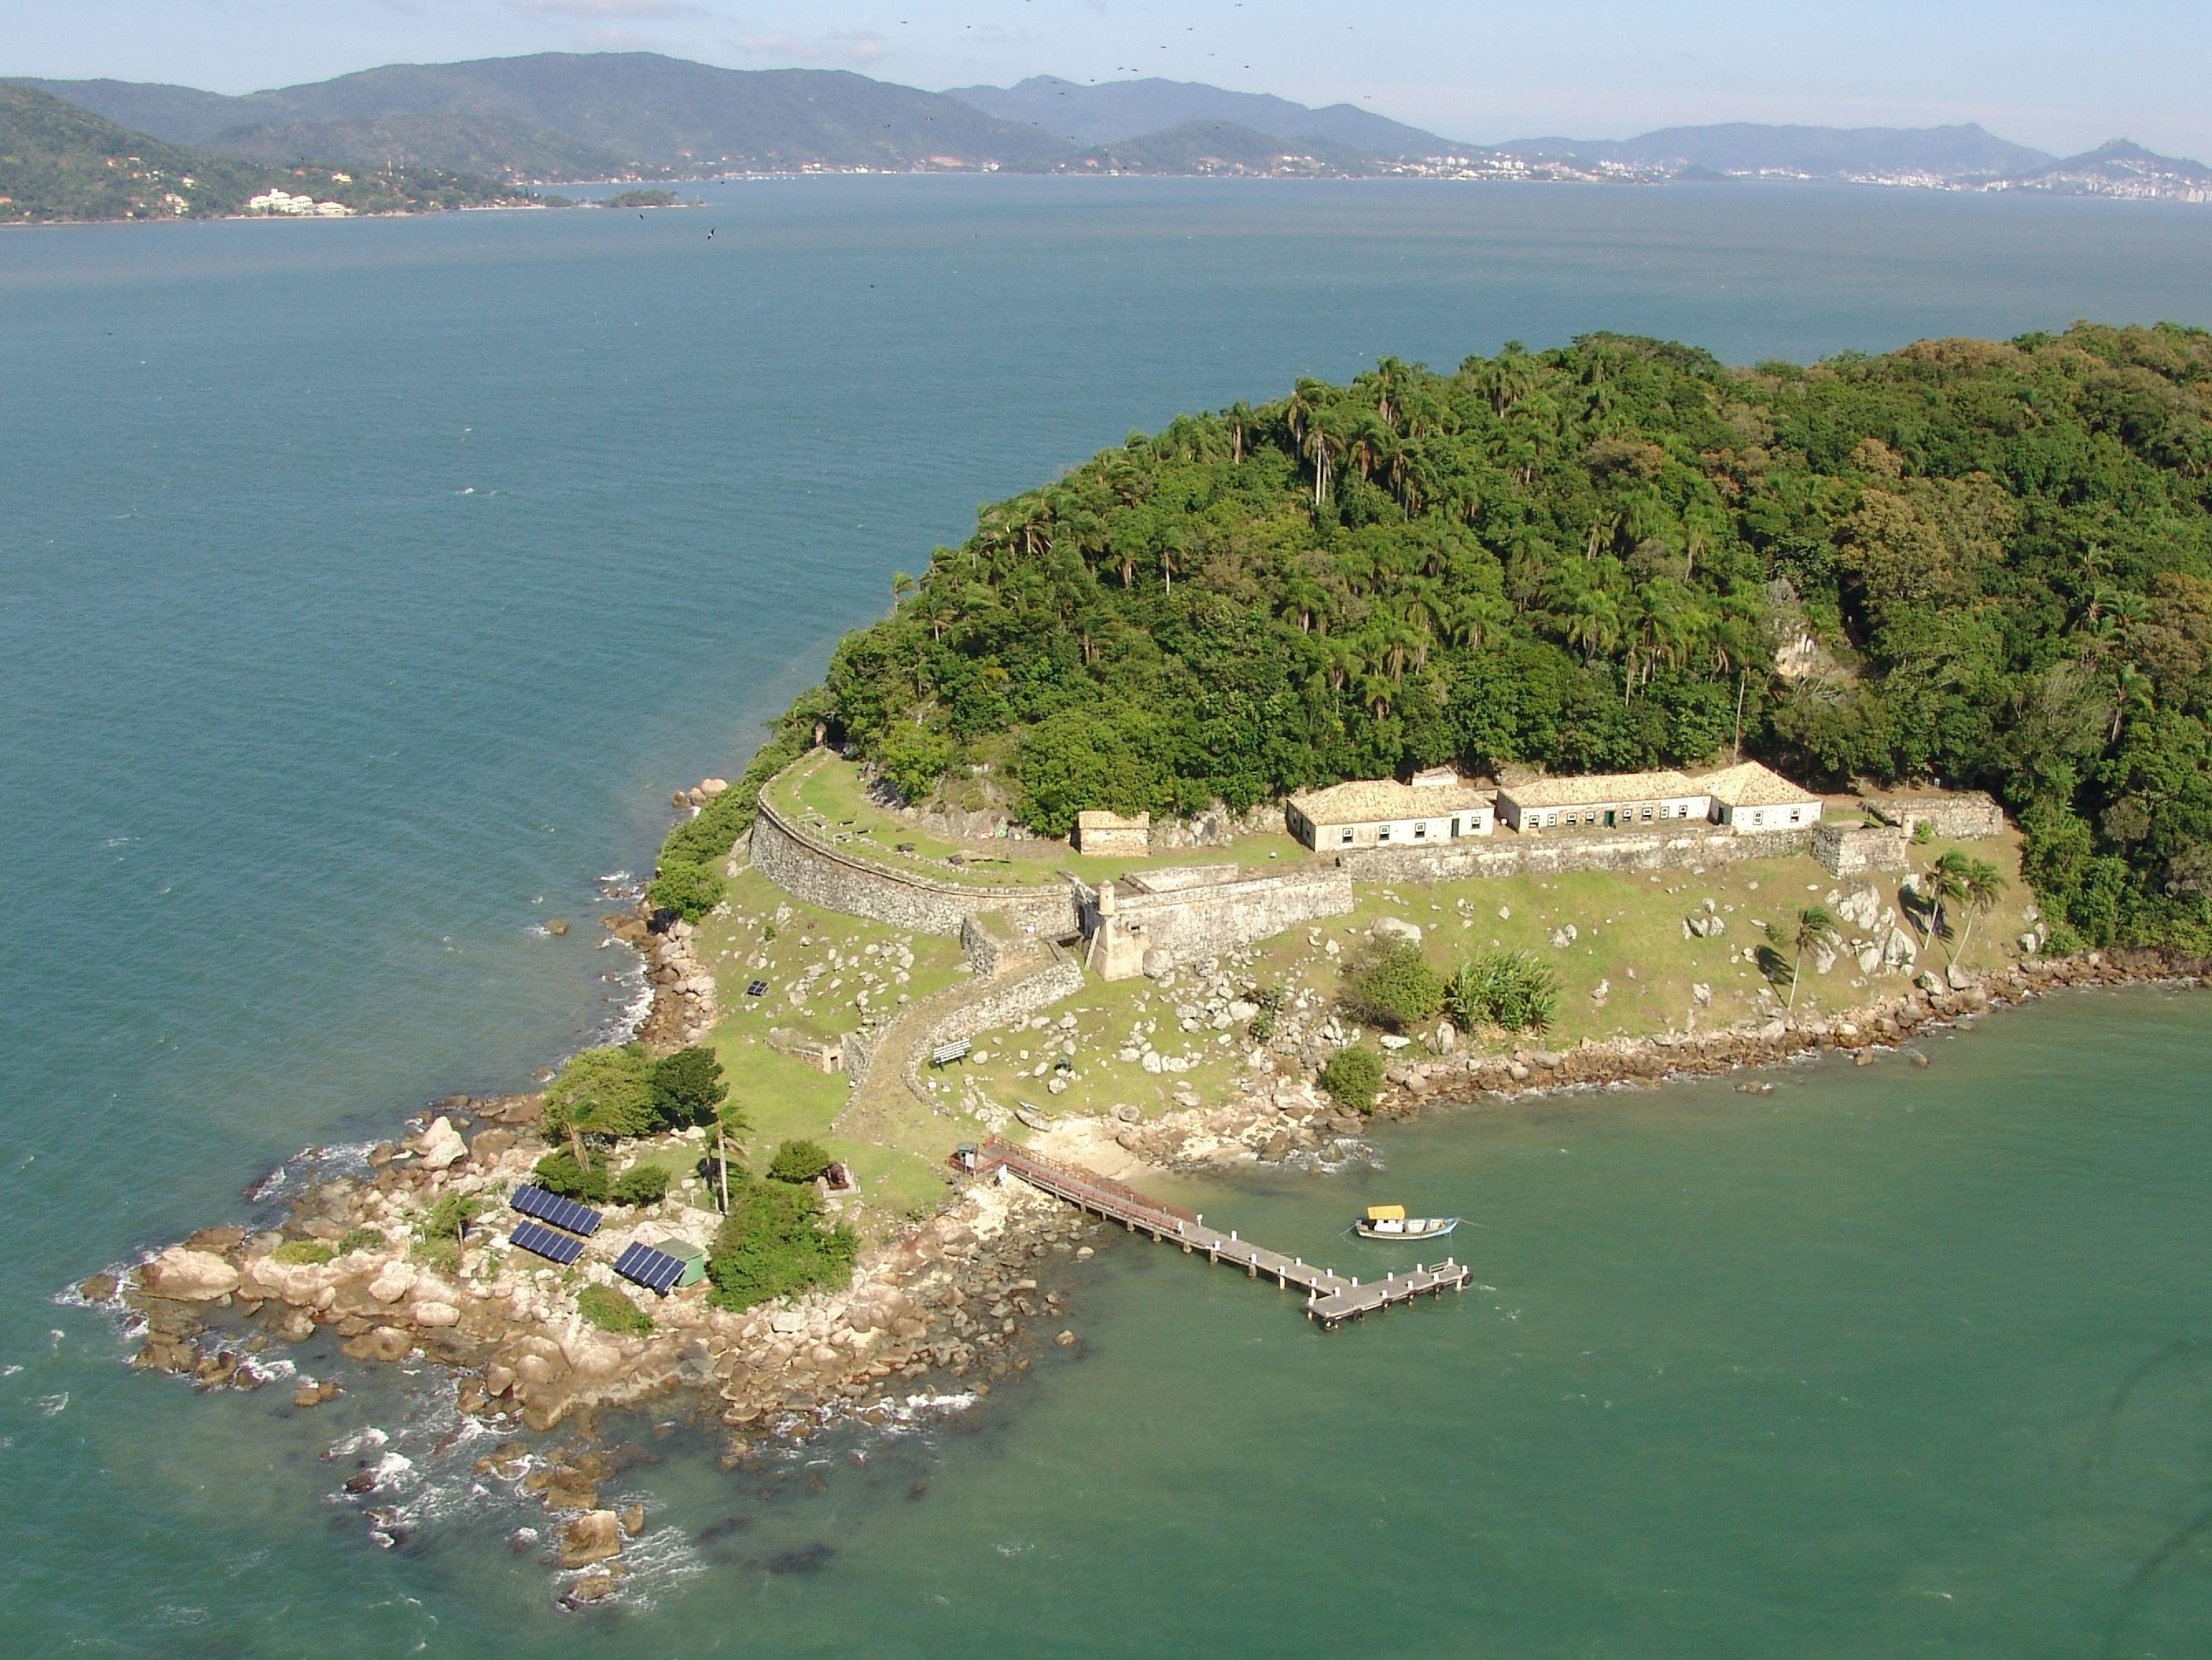 Projeto Fortalezas da Ilha de Santa Catarina » Fortaleza de Santo Antônio de Ratones